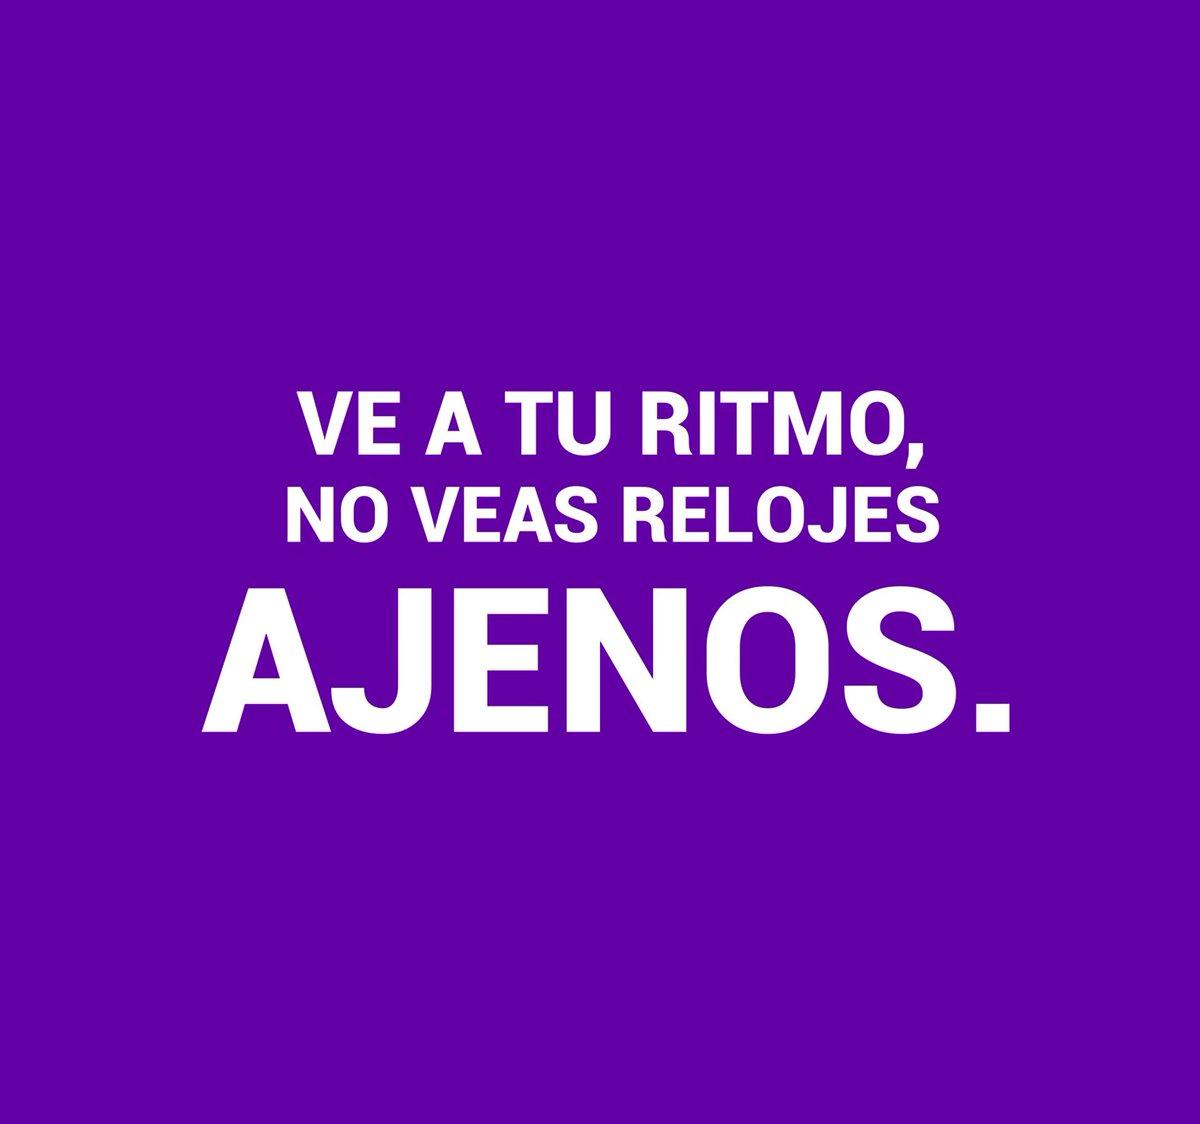 VE A TU RITMO, NO VEAS RELOJES AJENOS. . . . #Vida #ritmo #amor #suave #despacito #sinafan #calma #loquefuefue #frasesdeldia #lunes